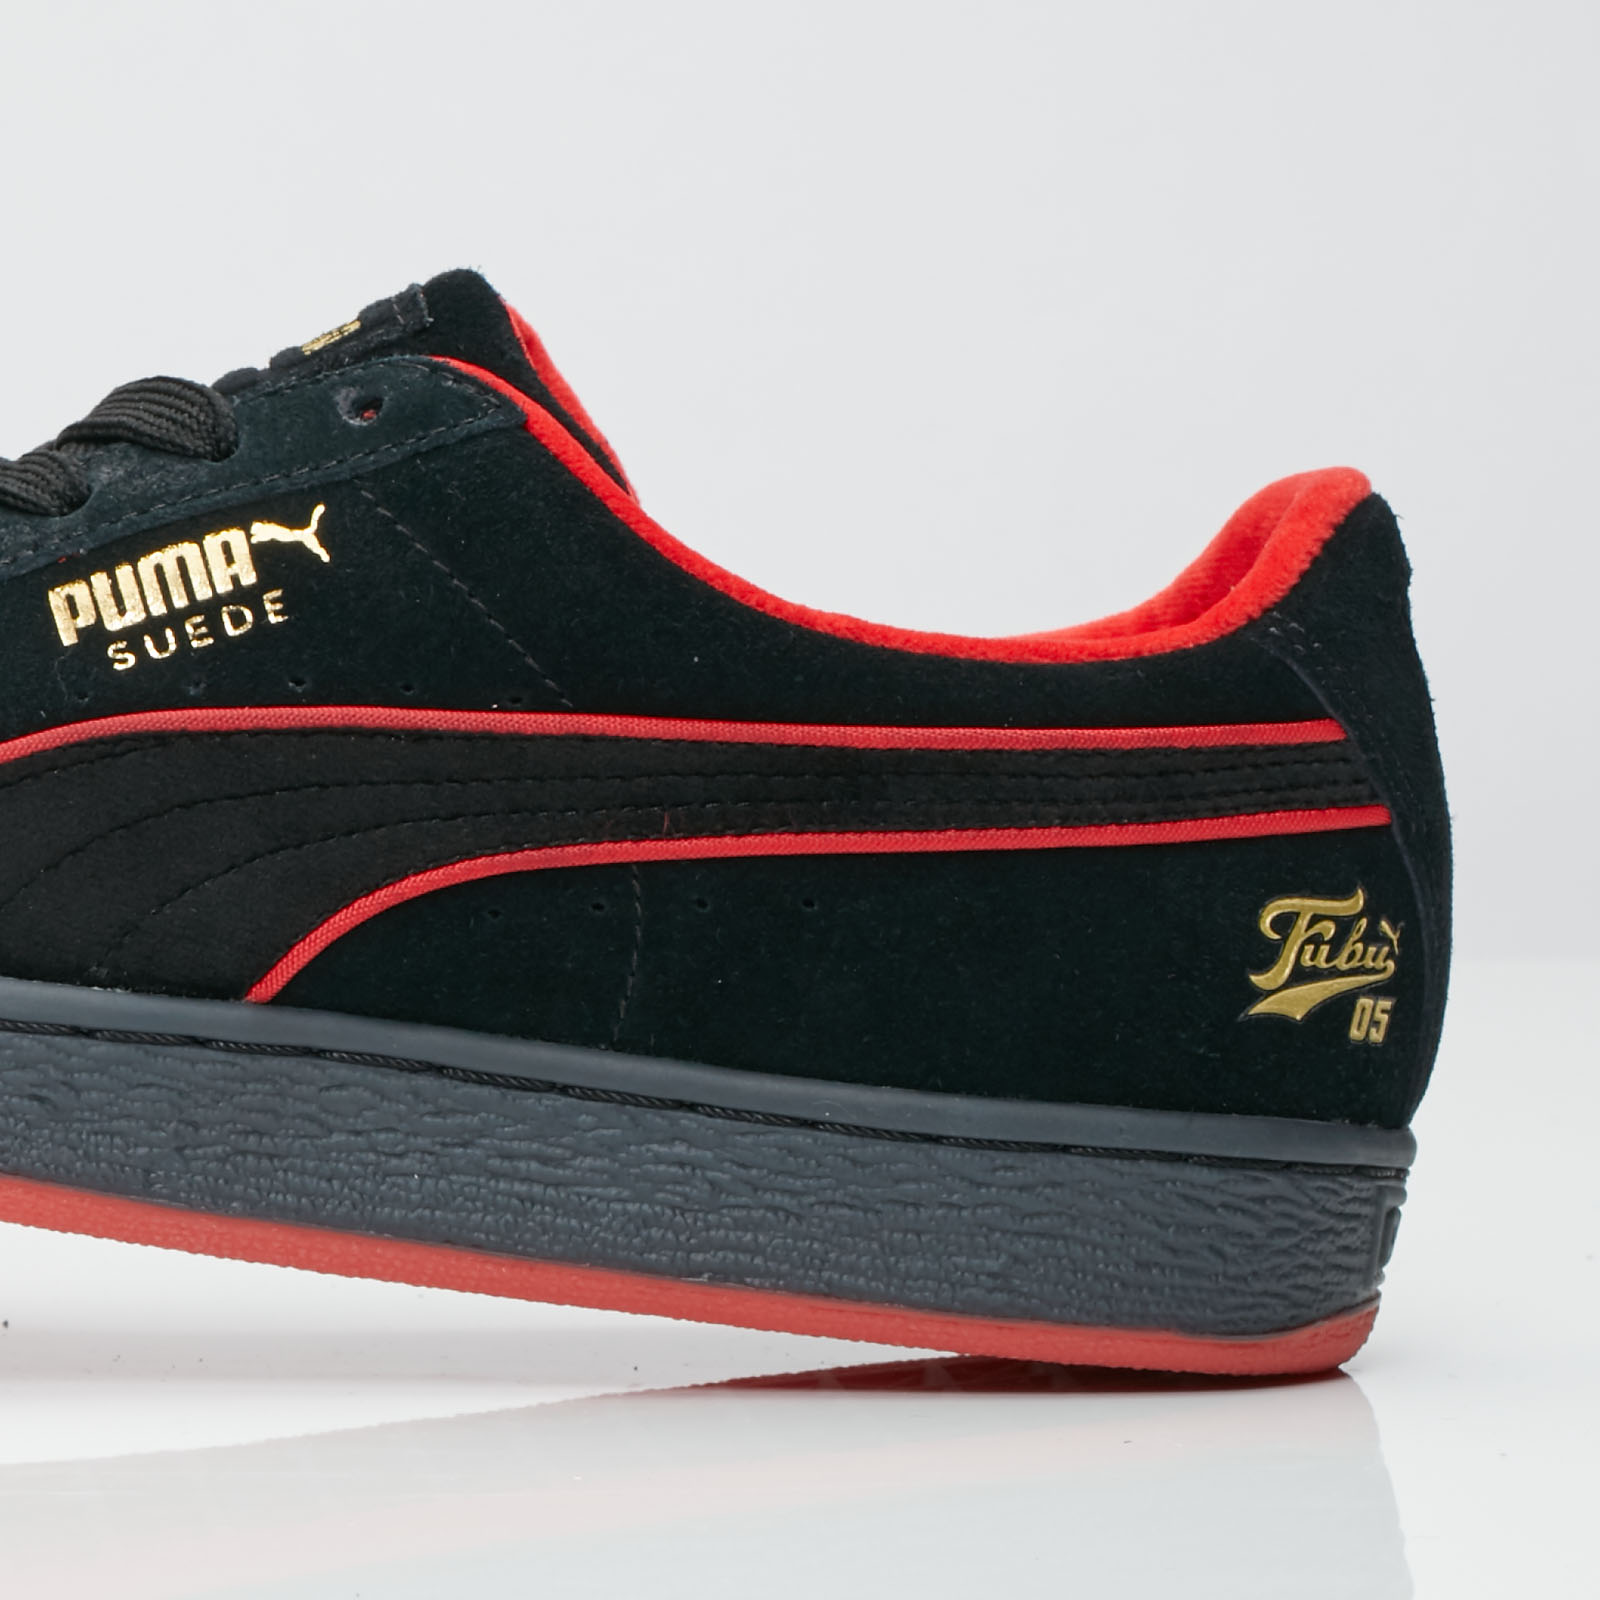 official photos e6440 736a7 Puma Suede Classic X FUBU - 366320-02 - Sneakersnstuff ...